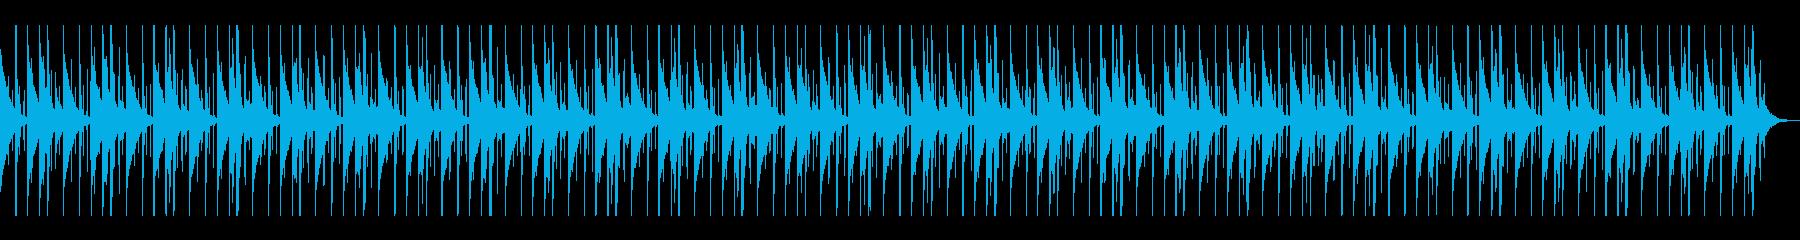 SFXなしのパーカッション5と同じの再生済みの波形